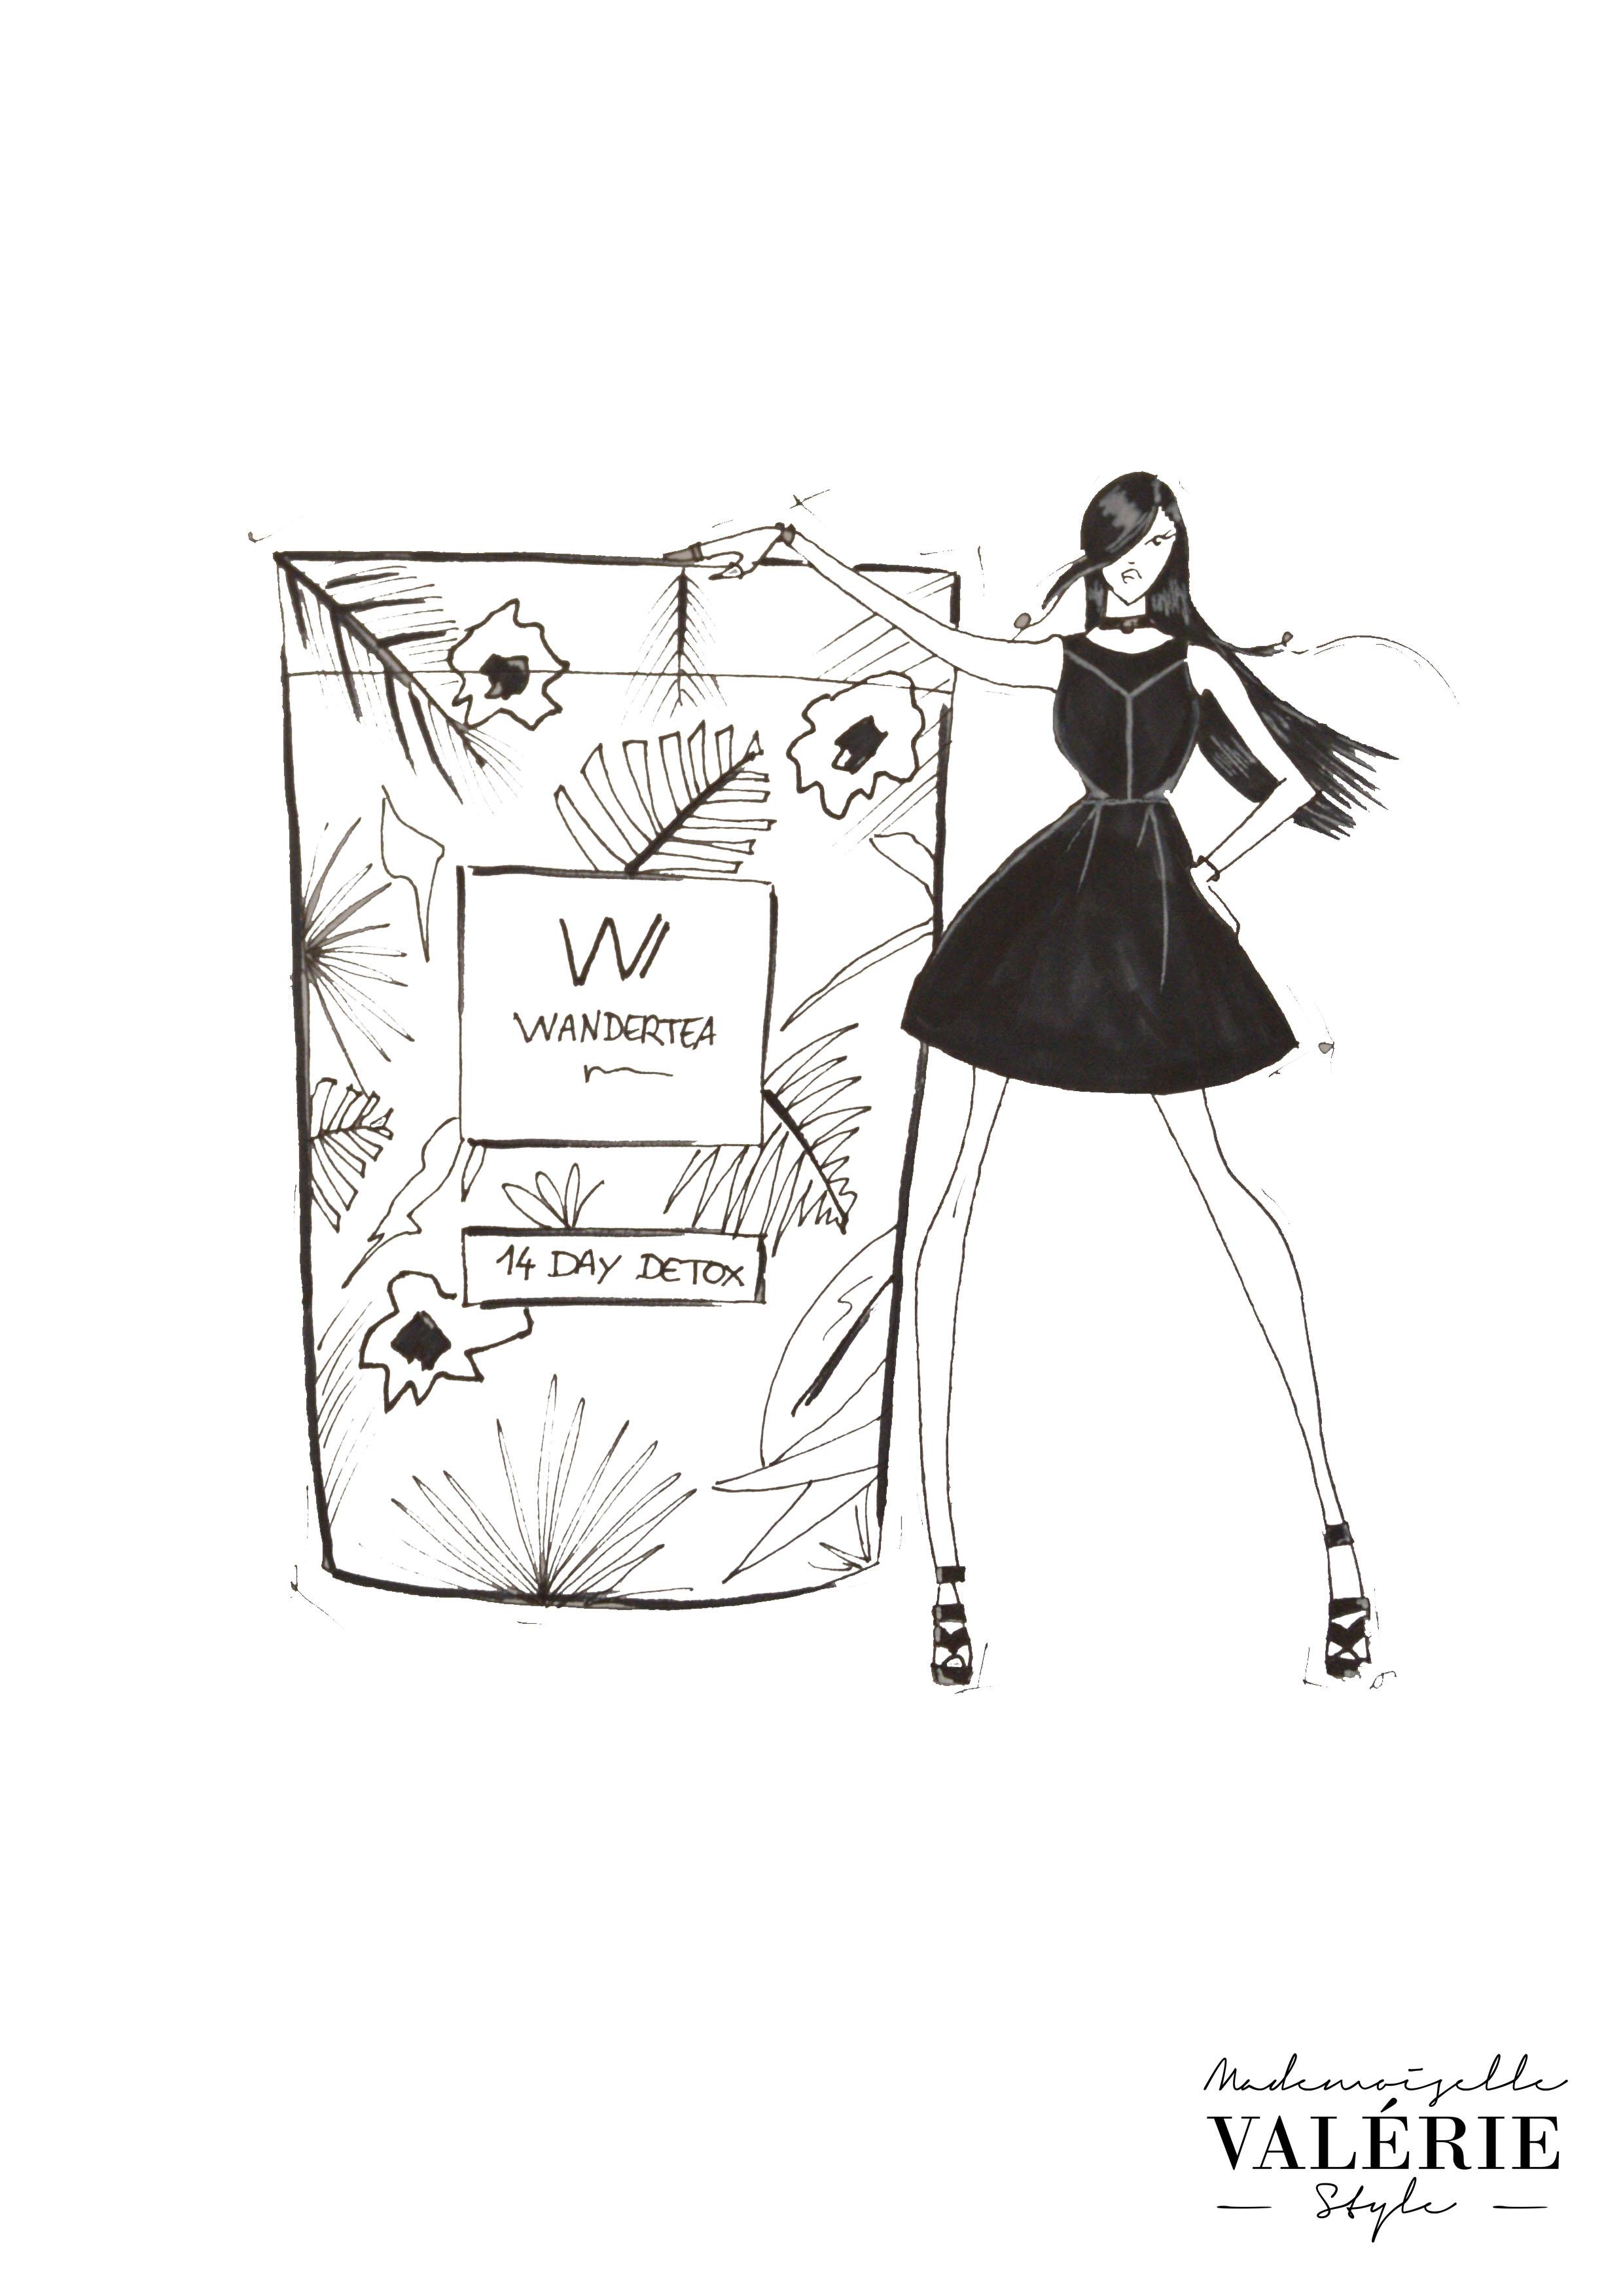 Wandertea Mademoisellevalerie